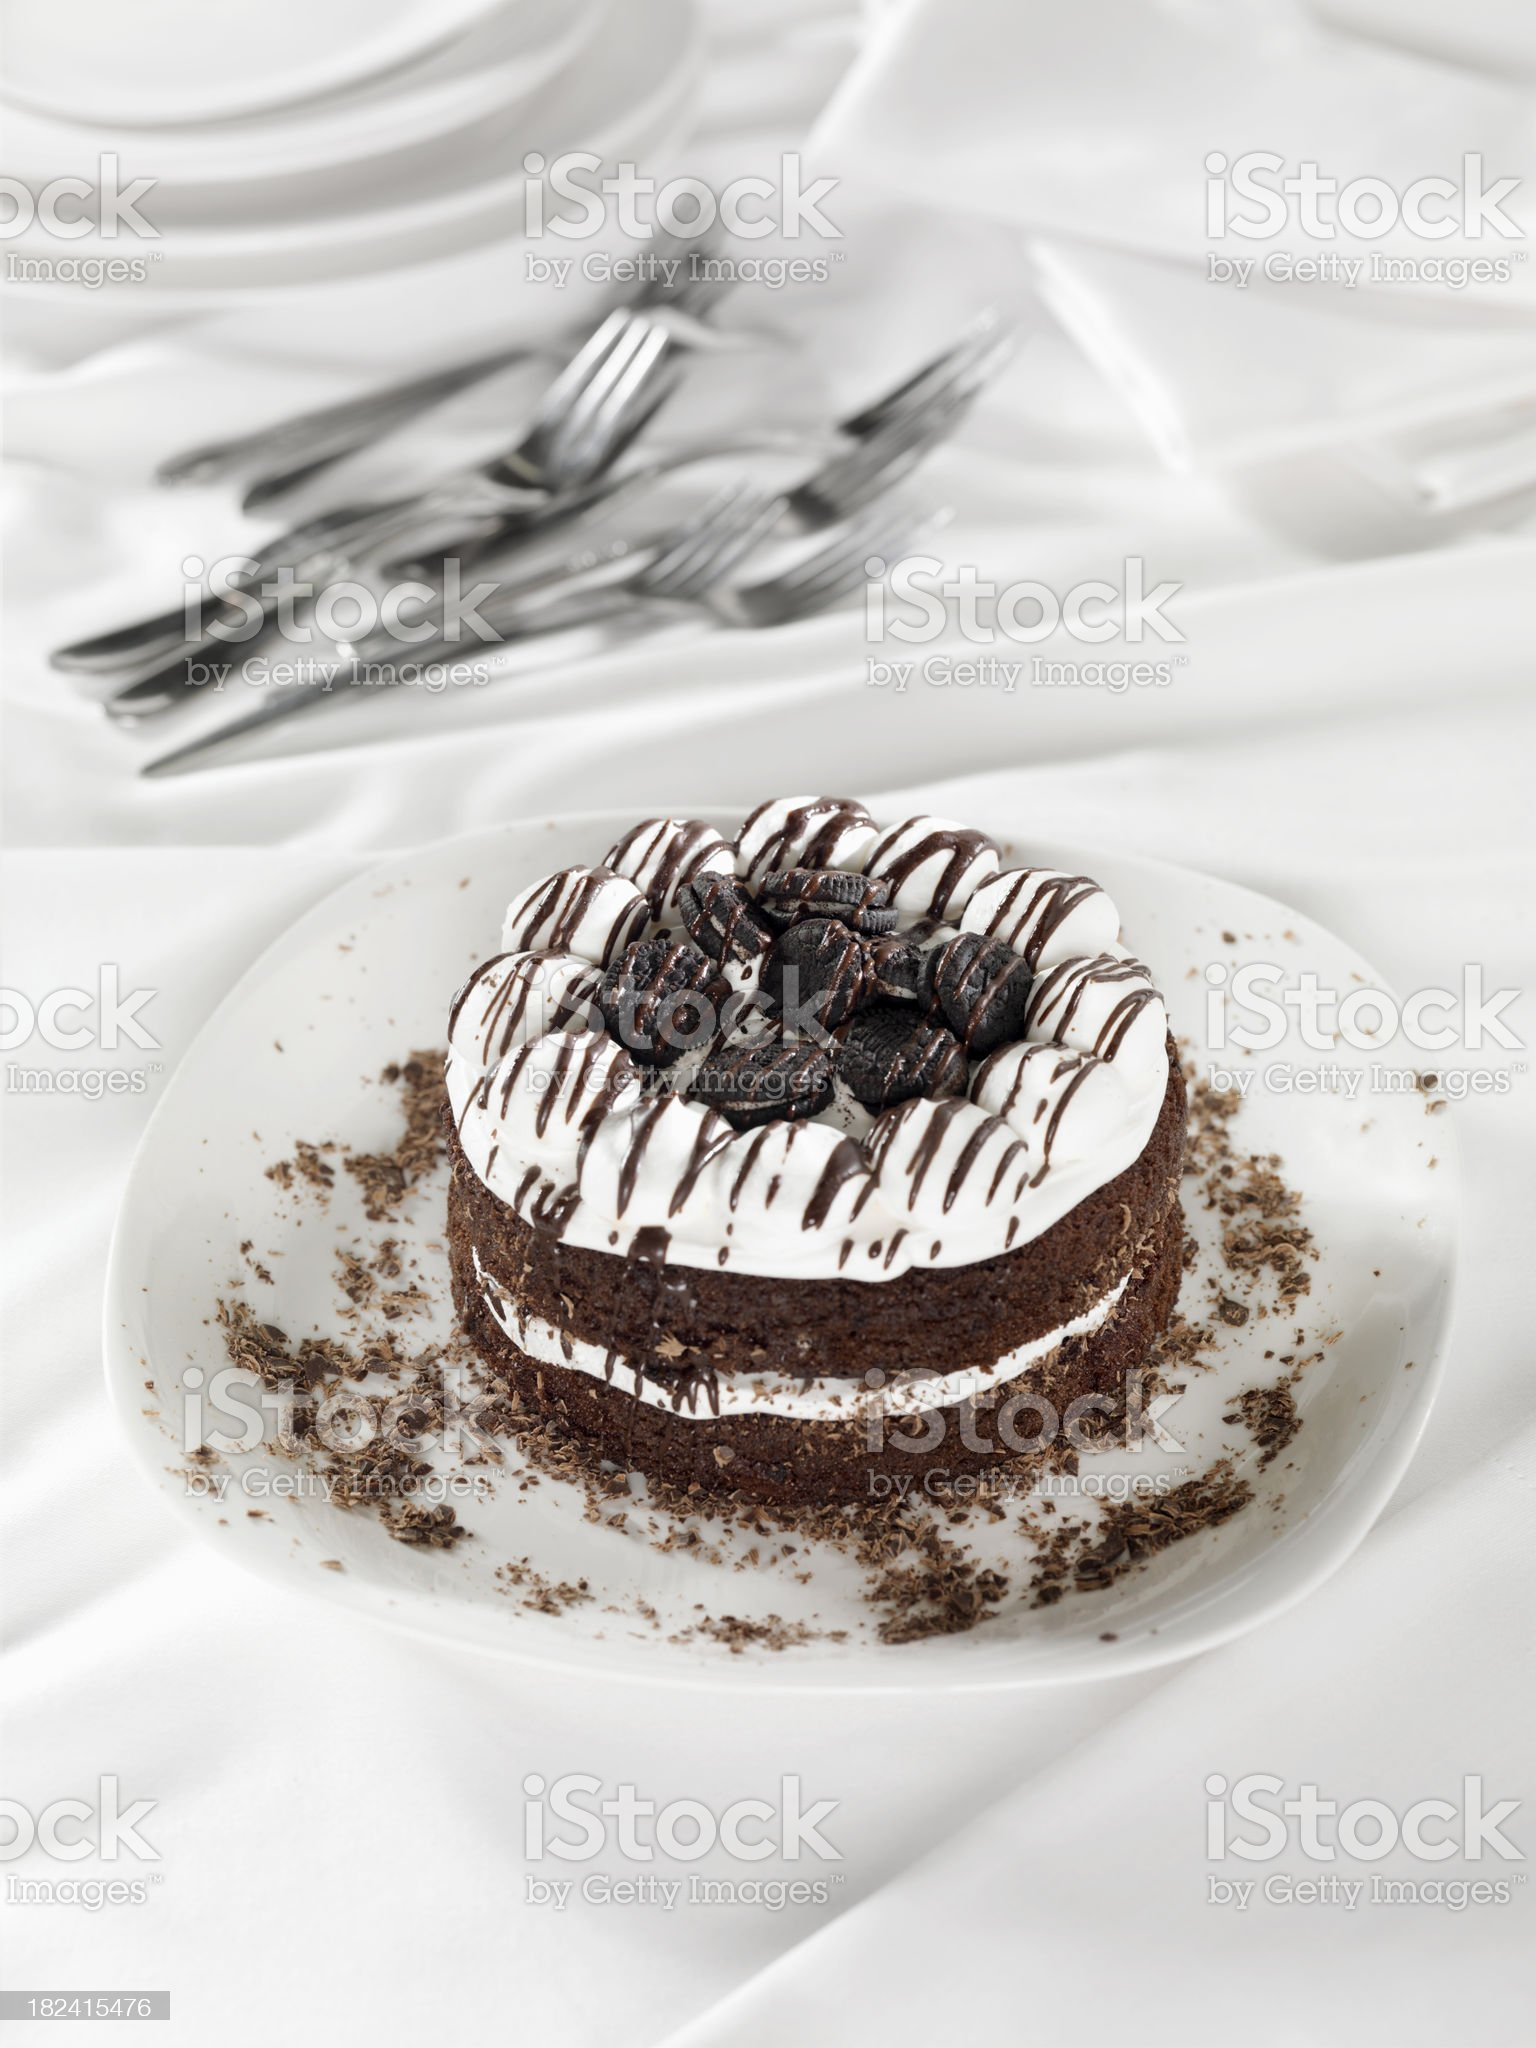 Chocolate Cookies and Cream Cake royalty-free stock photo